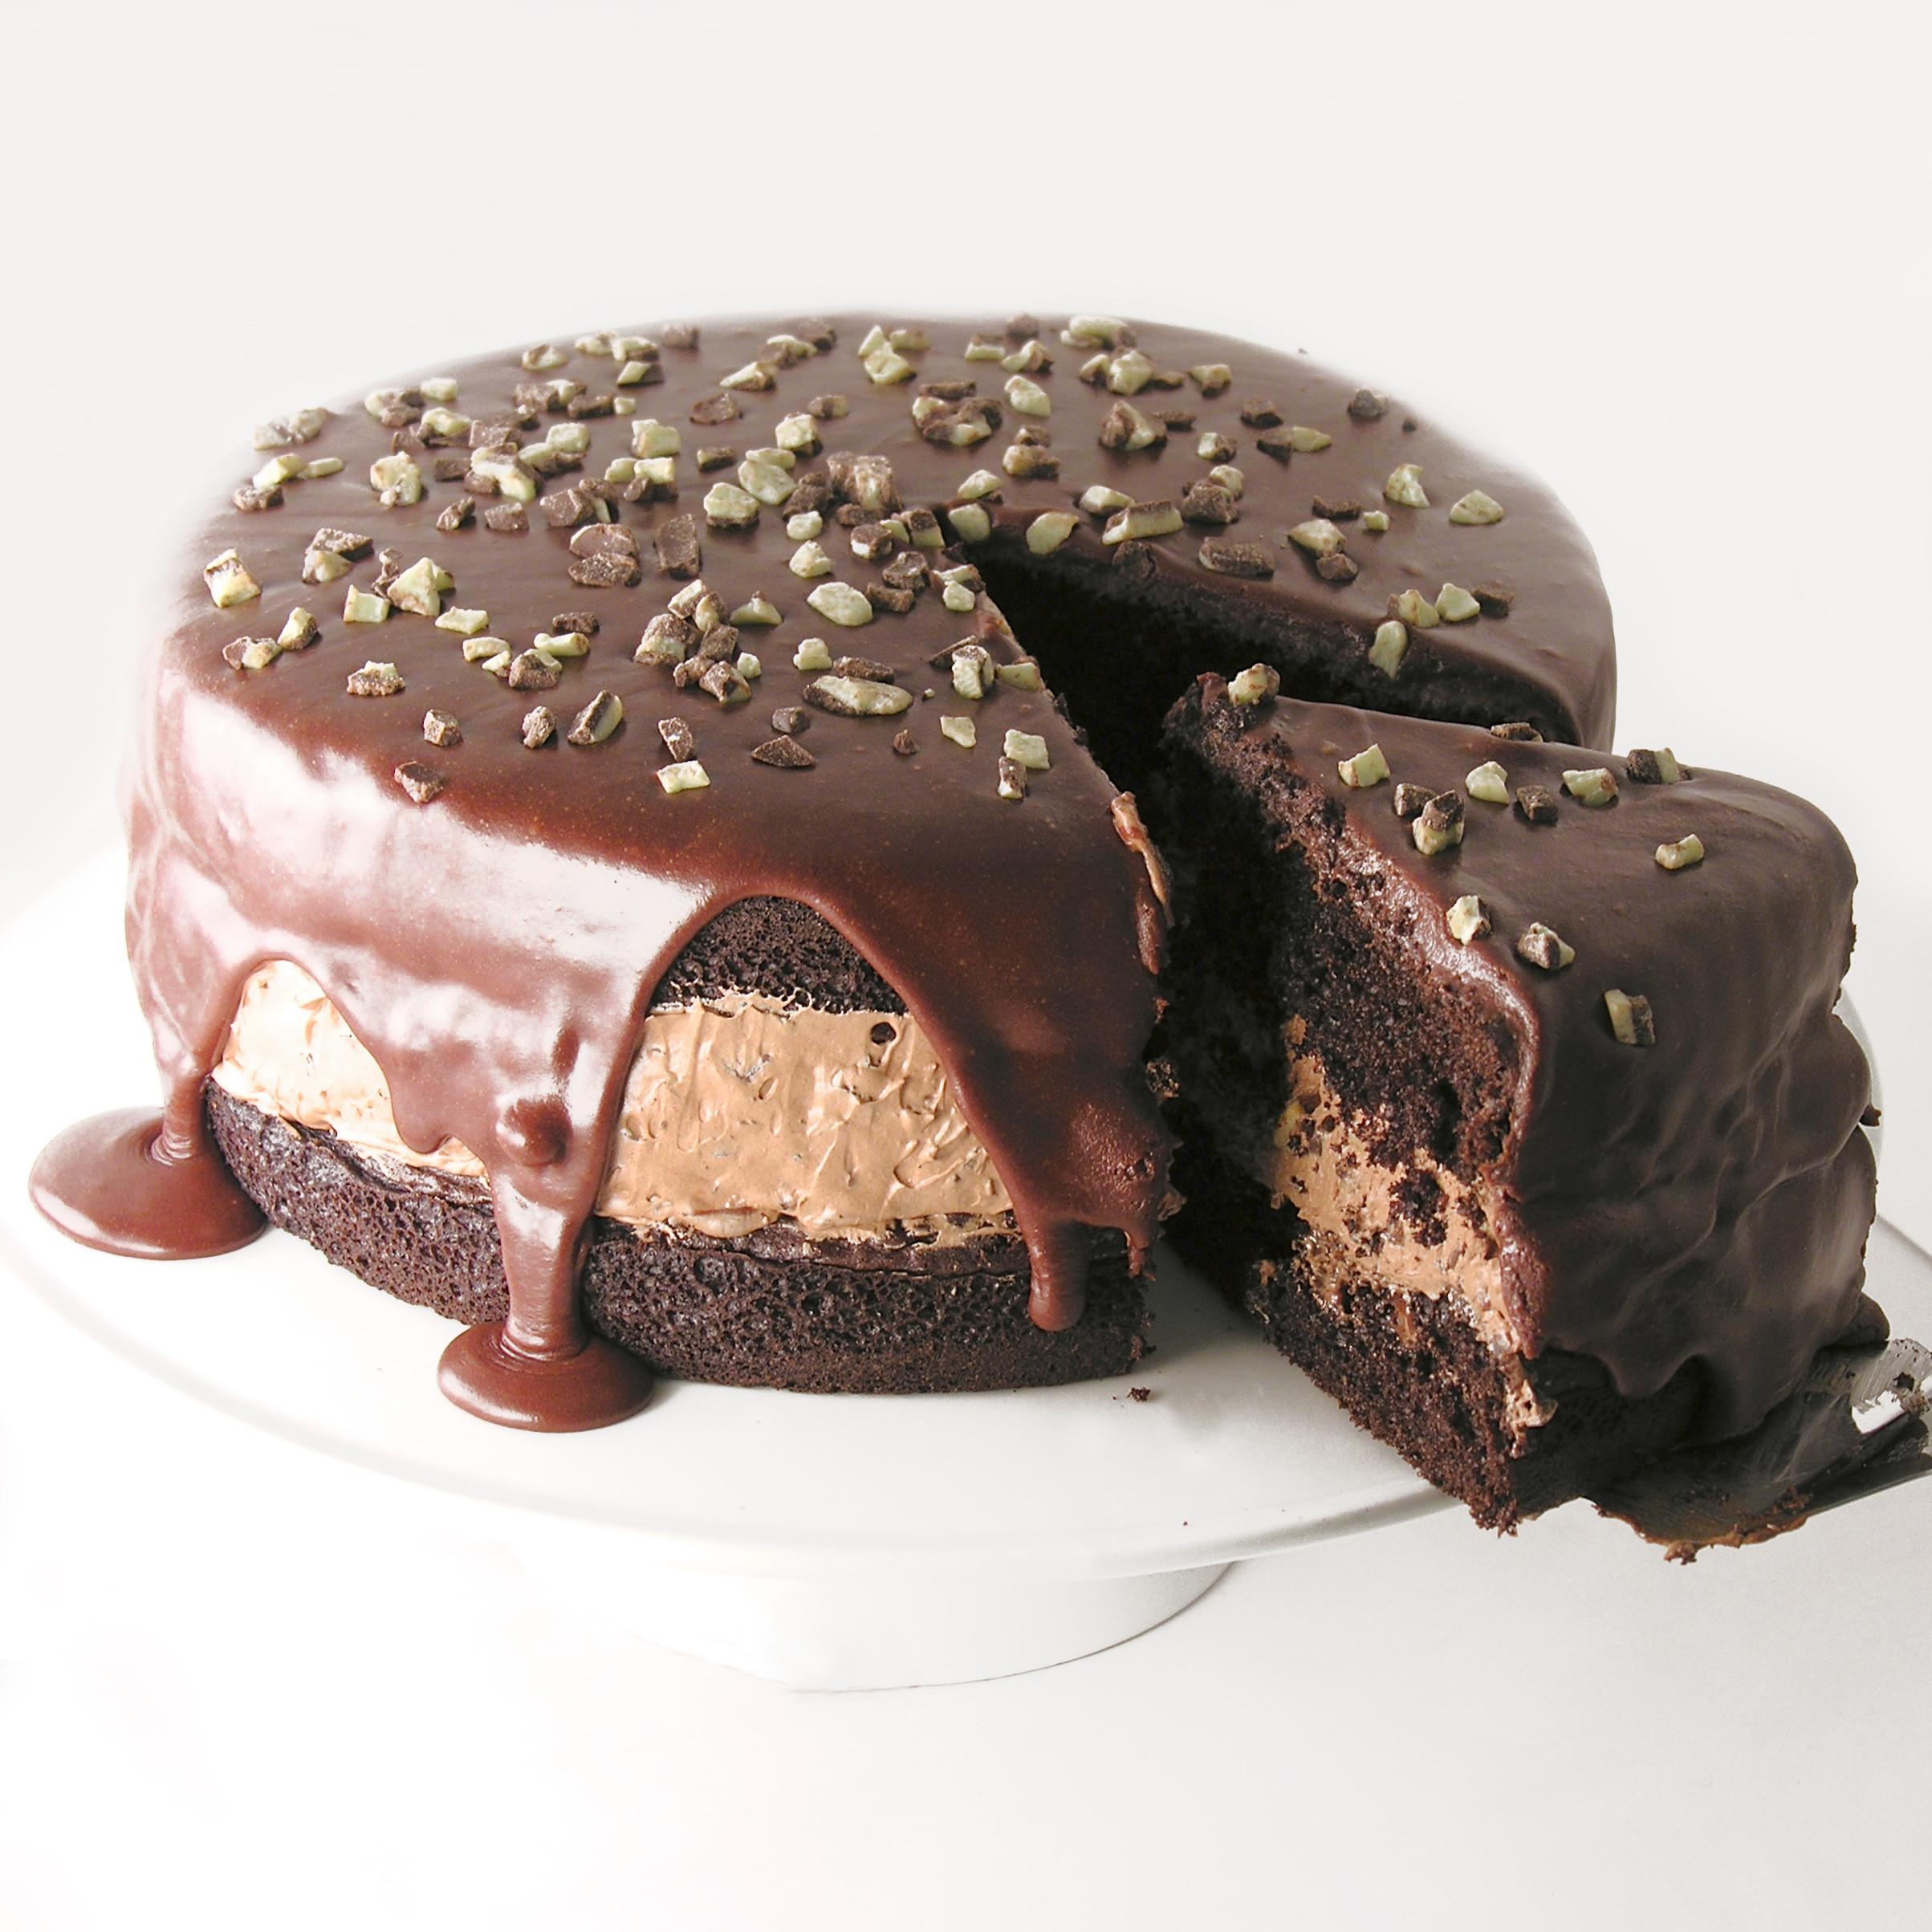 Cake Mix Dessert  chocolate cake mix